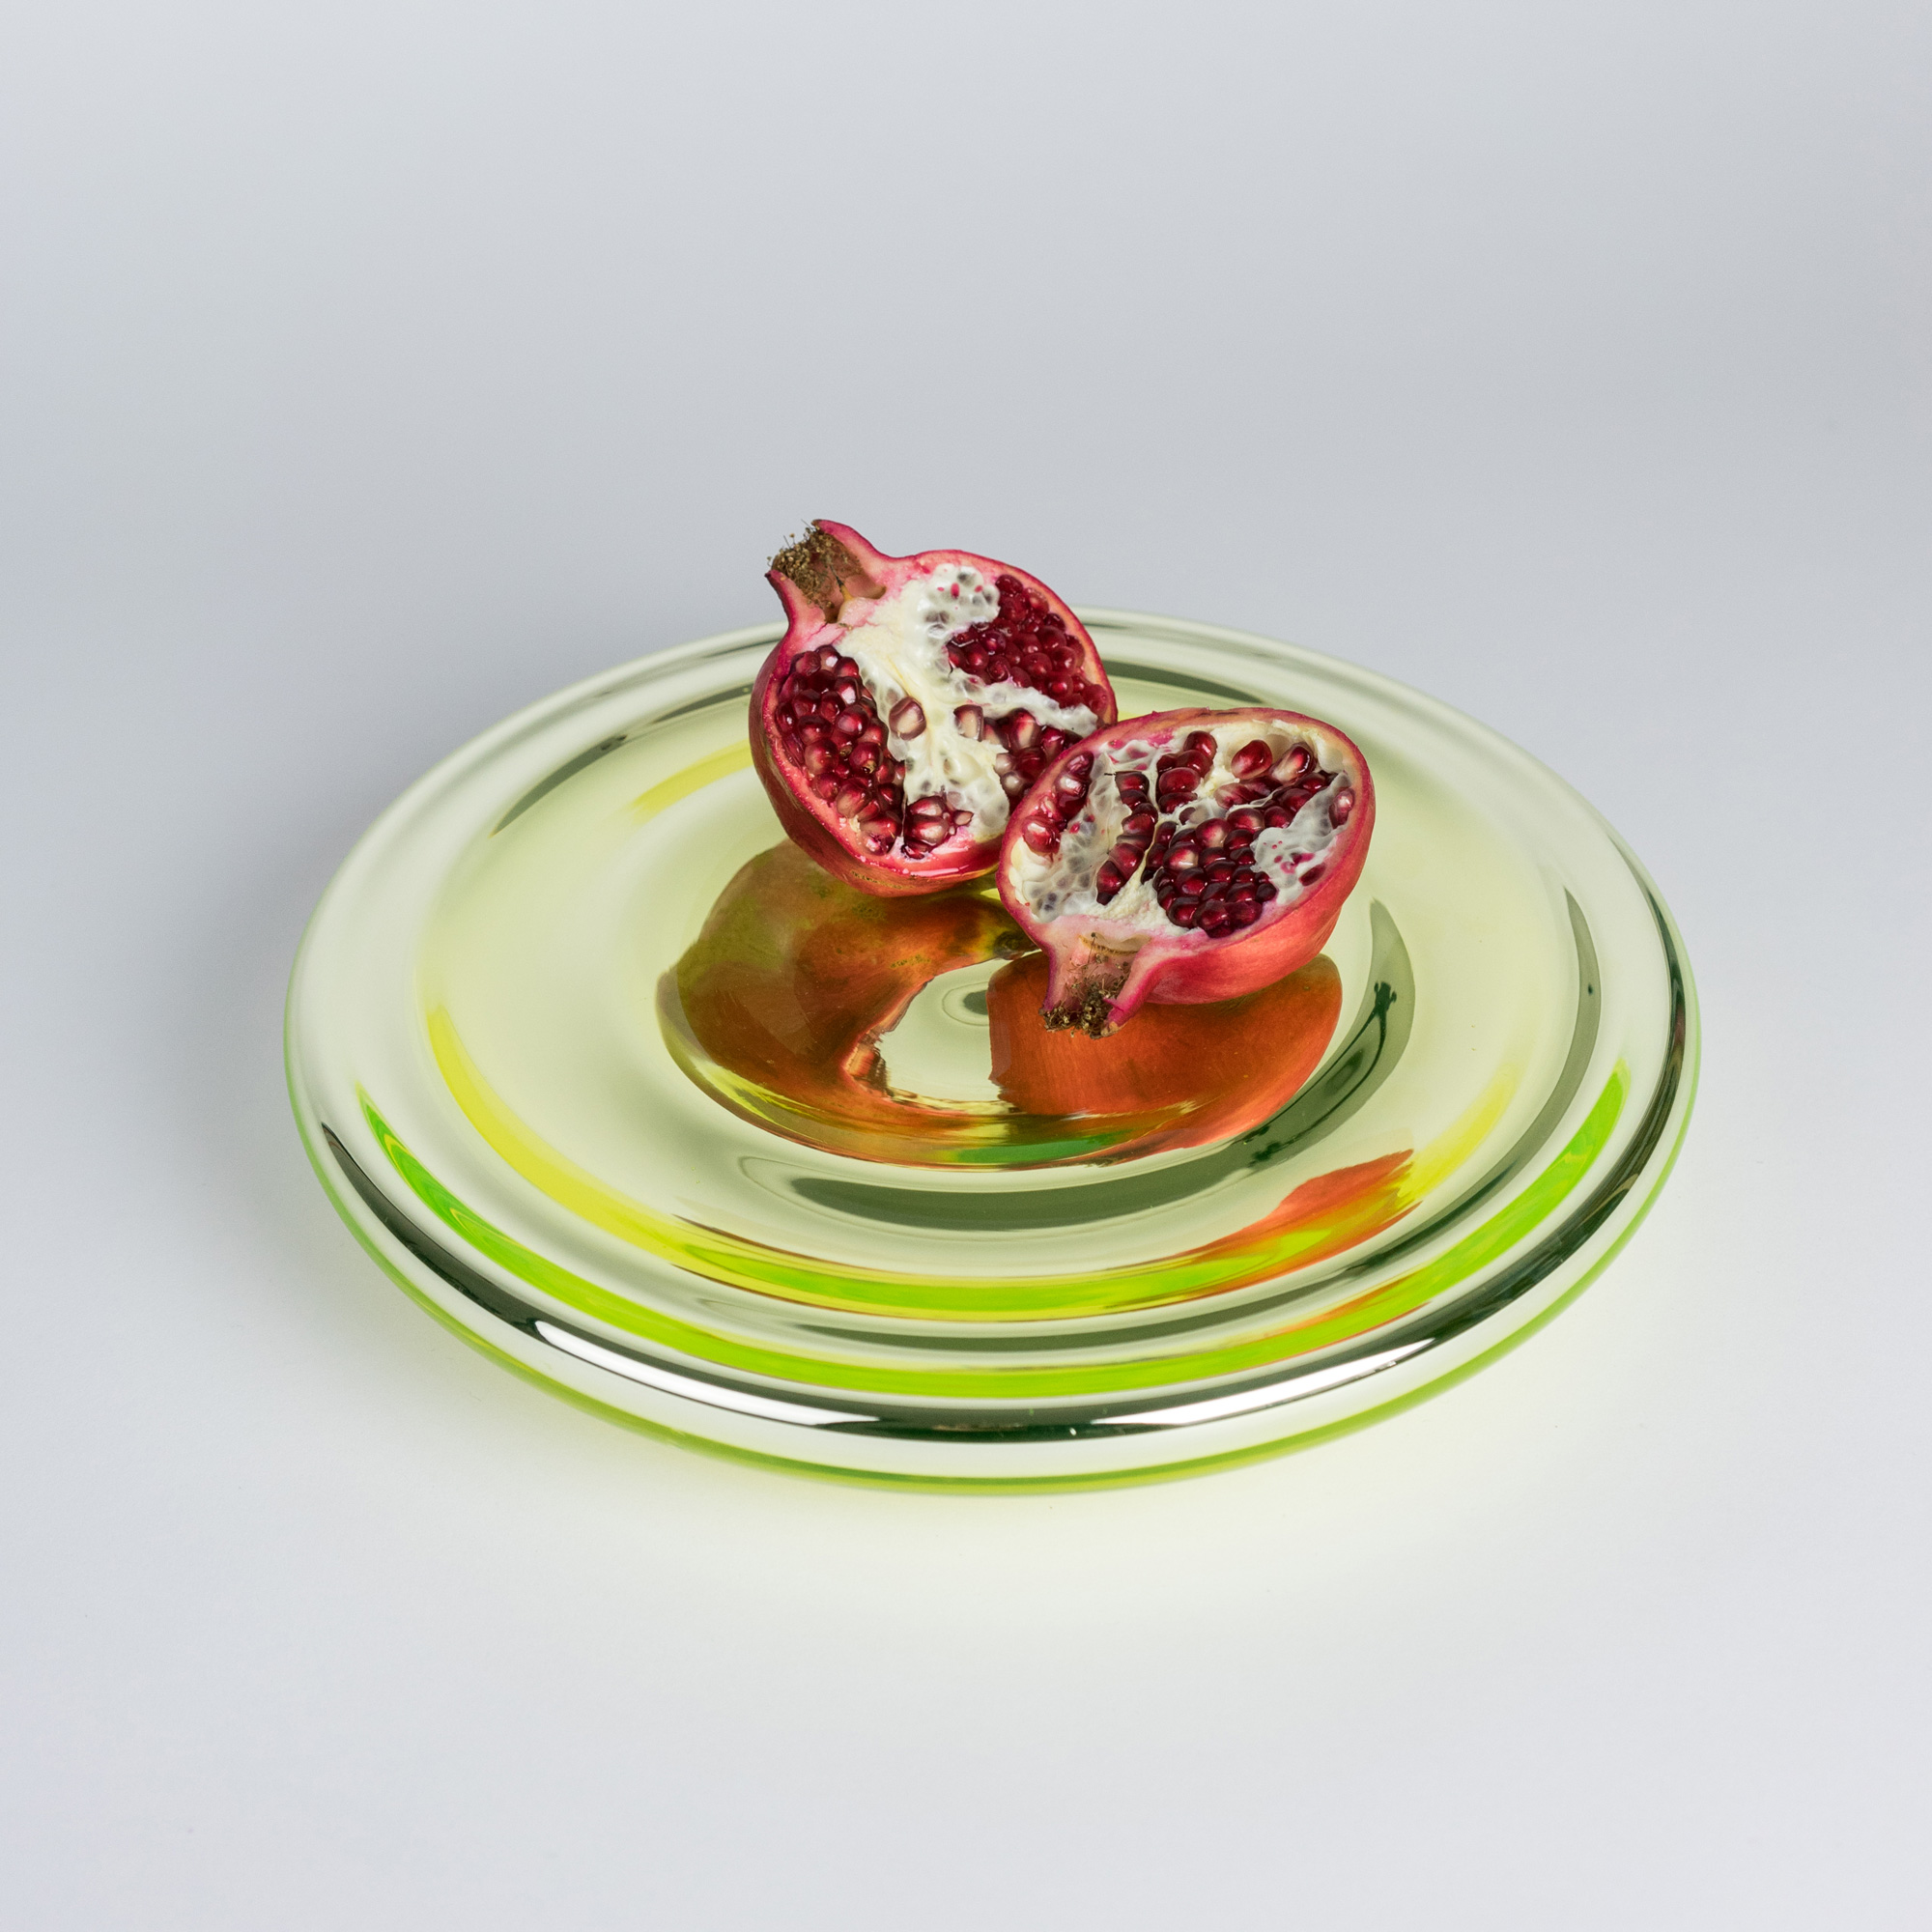 Uranium glass bowl with pomegranate by Michal Prazsky